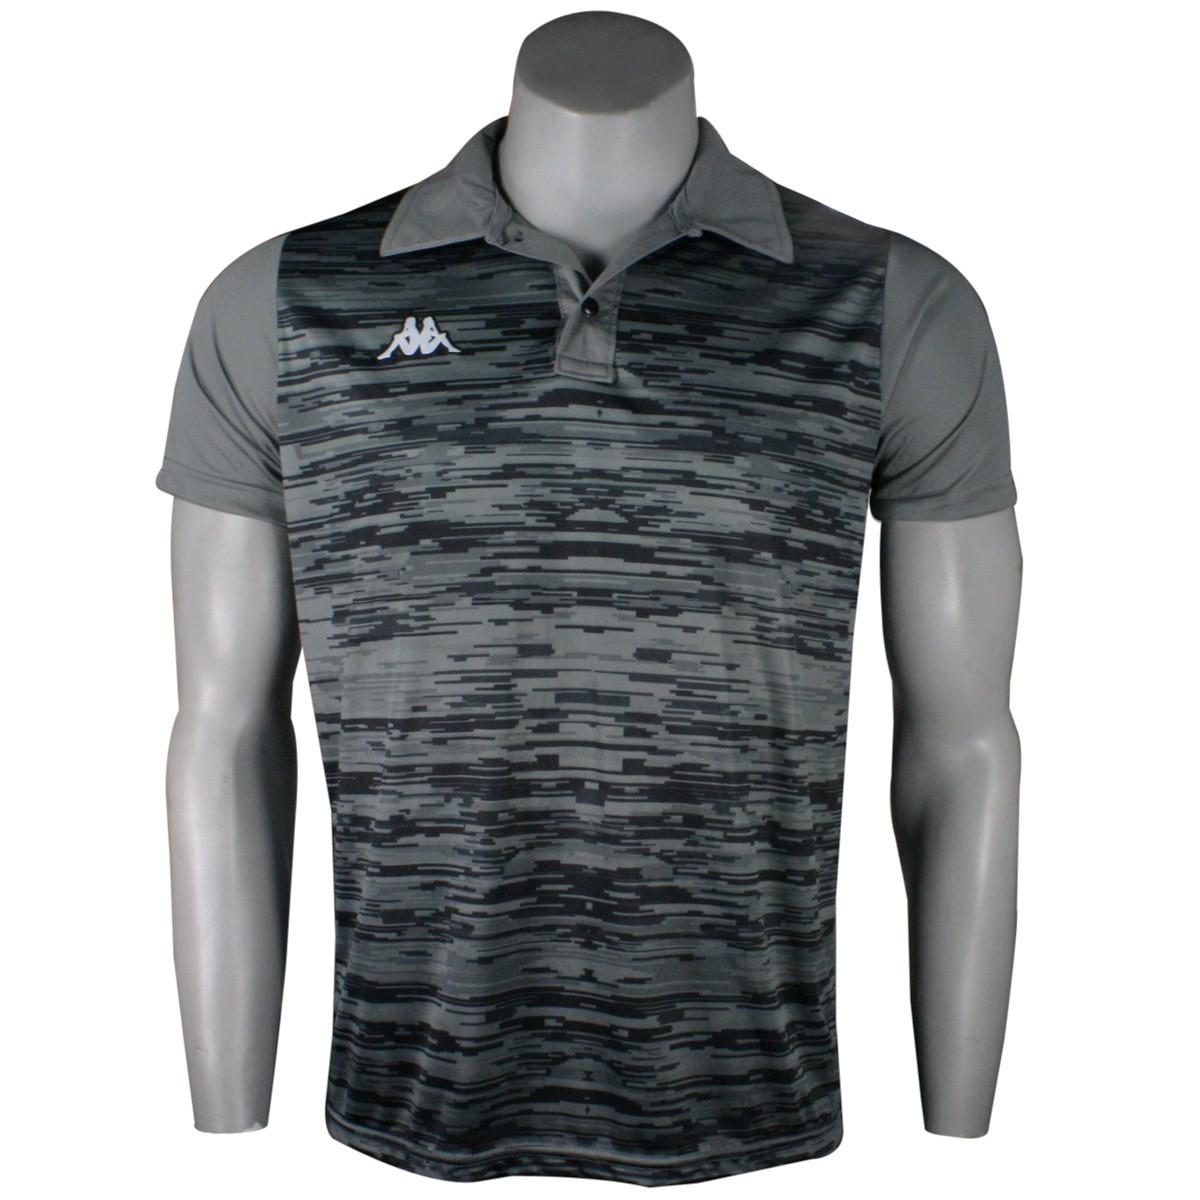 7085c77d59 Camiseta Polo Kappa Jenner Masculina KP0127001 044 - Chumbo - Botas ...